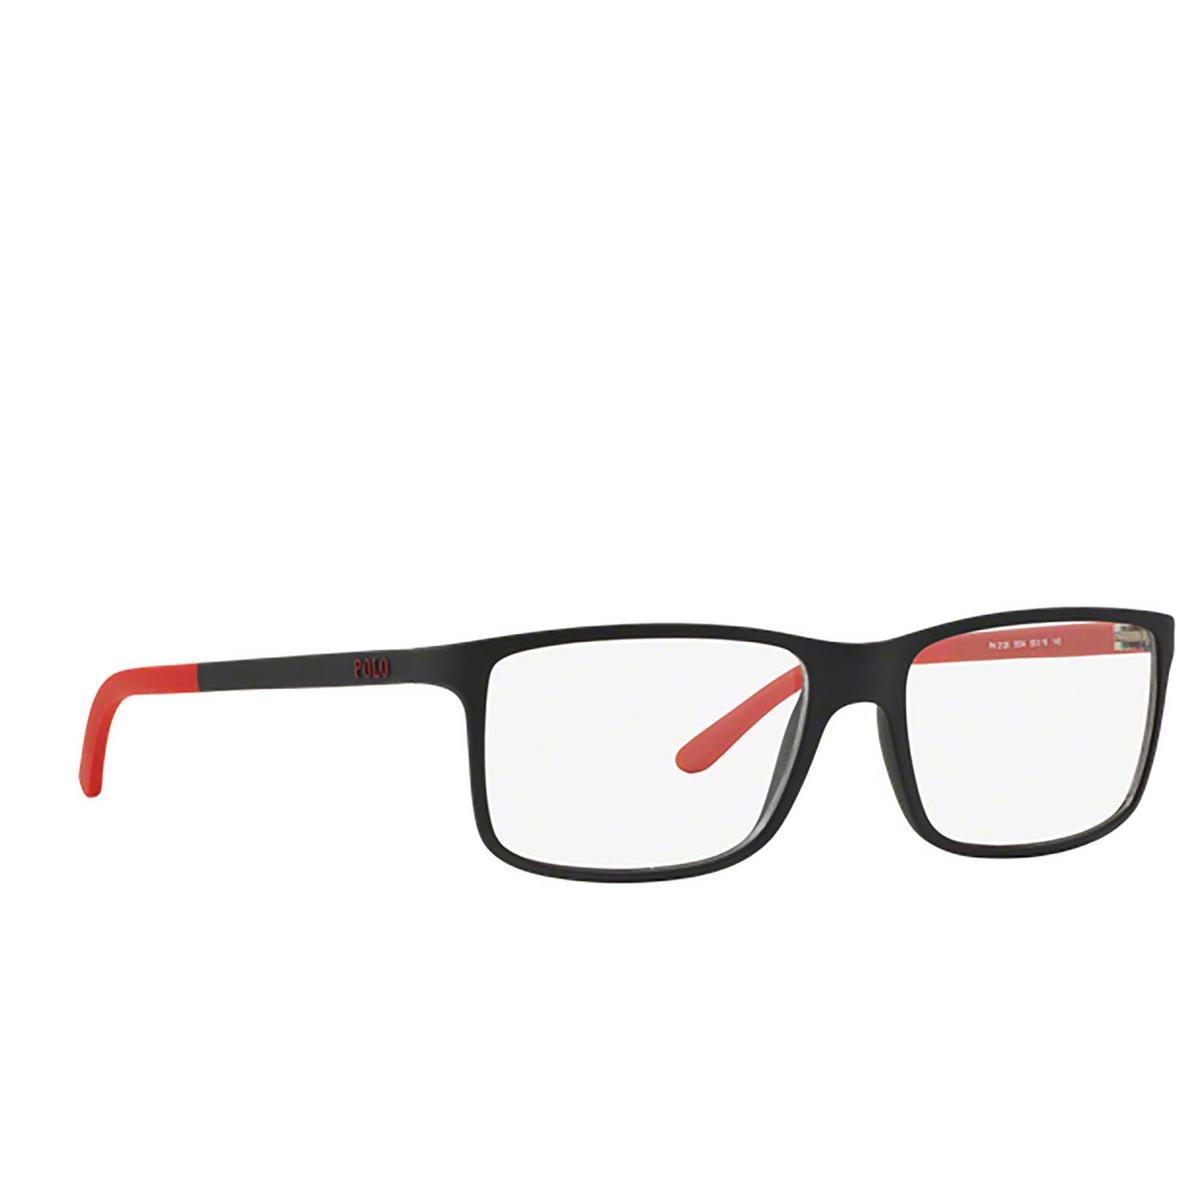 Polo Ralph Lauren® Rectangle Eyeglasses: PH2126 color Matte Black 5504.